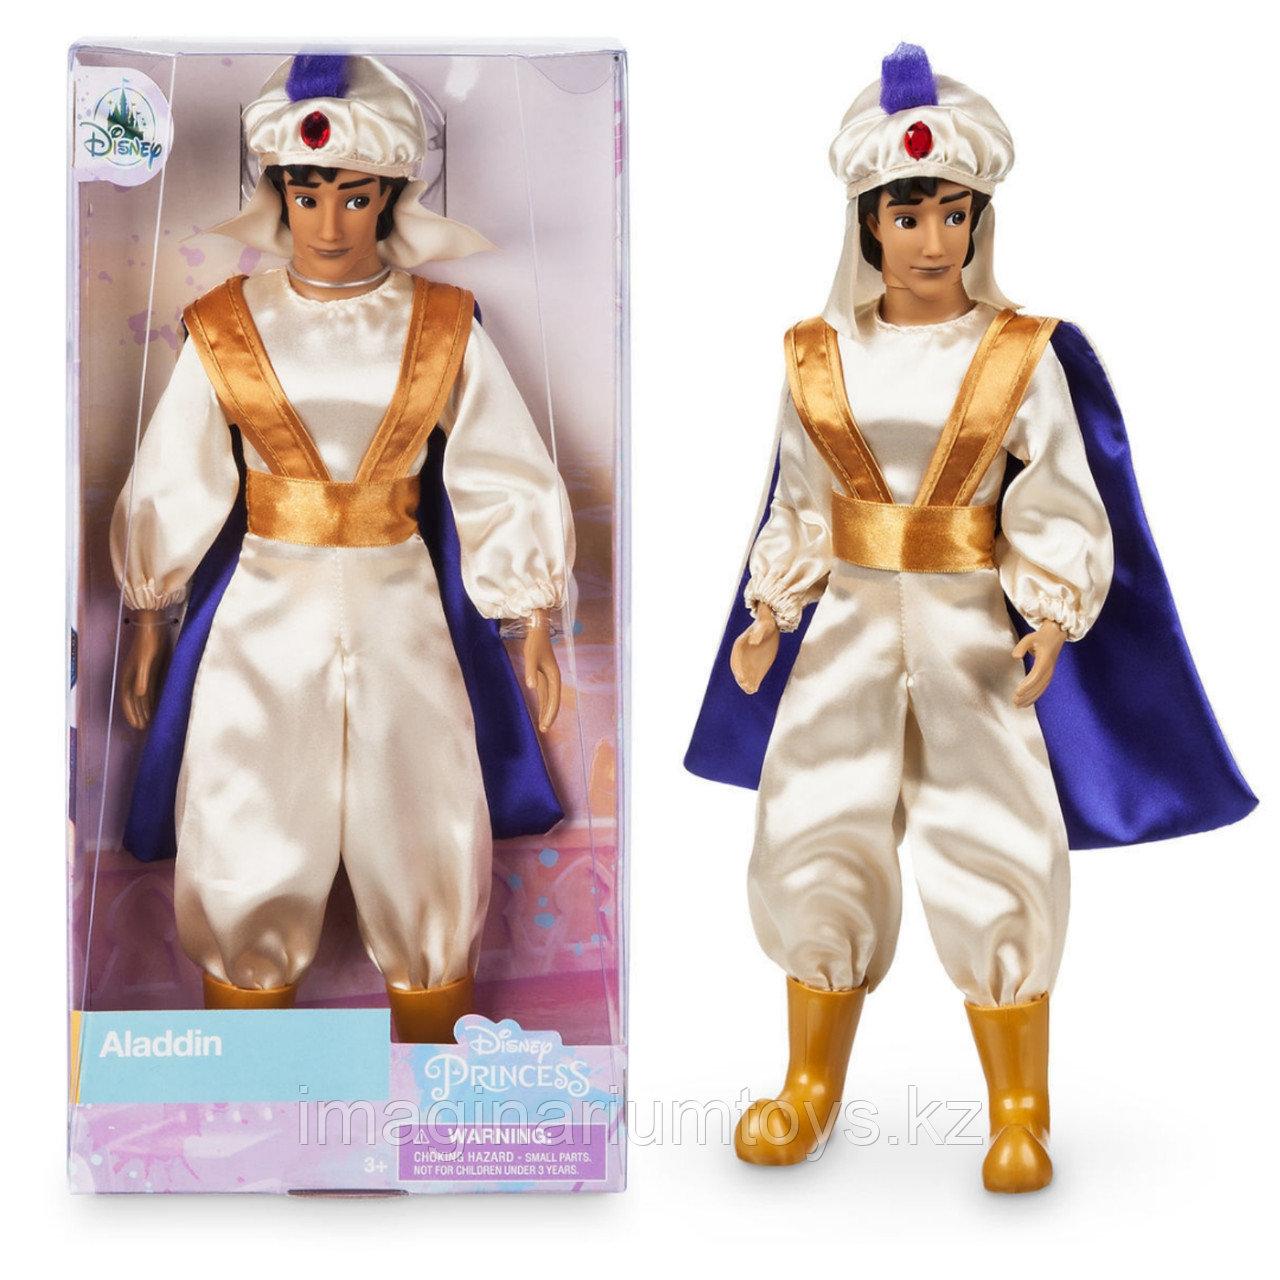 Кукла Принц Али из м/ф «Аладдин» Disney